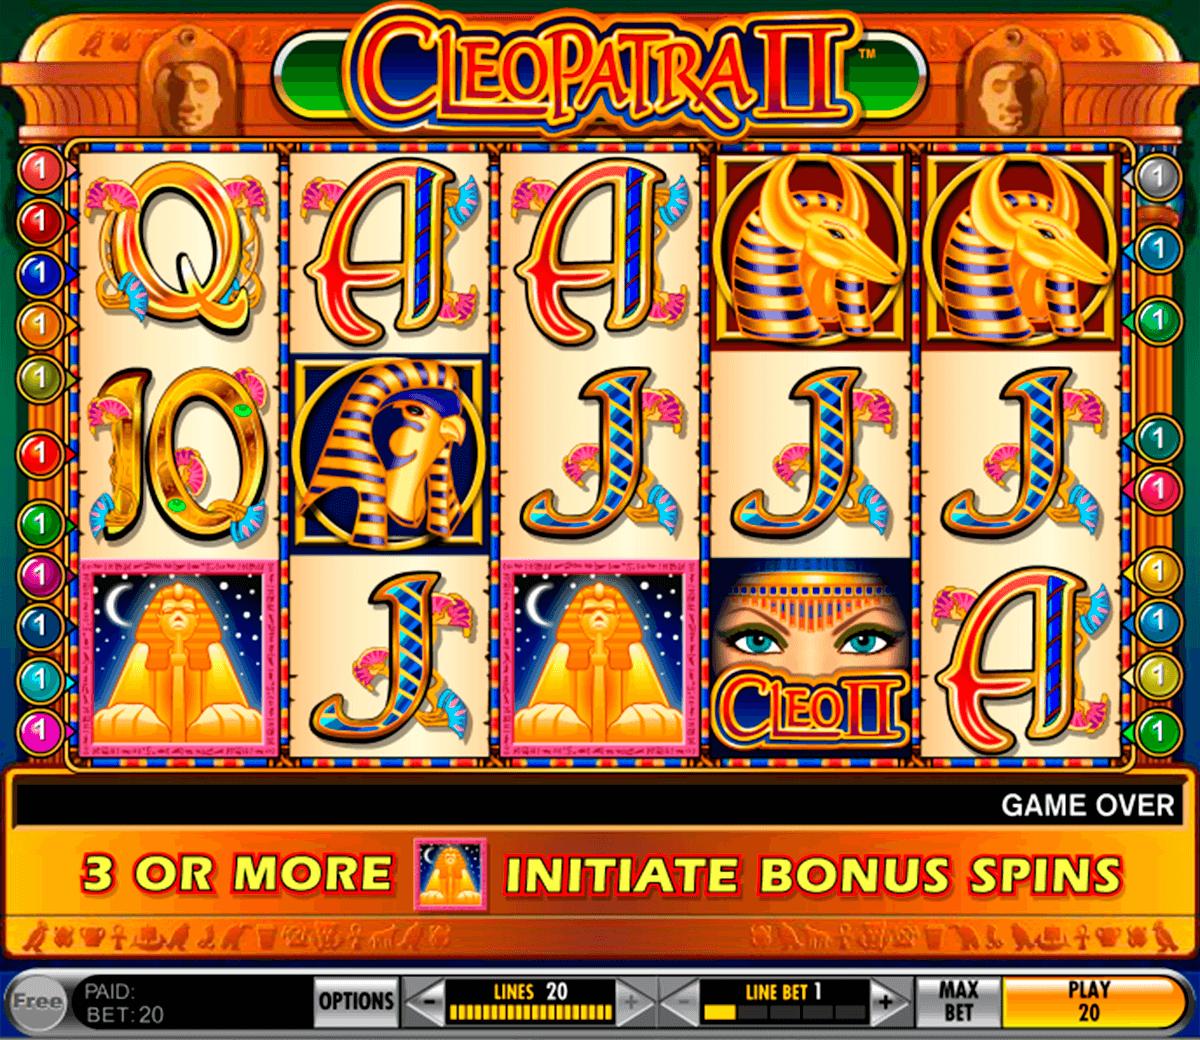 Bono casino betcris 50 maquinas tragamonedas pantalla completa-876493